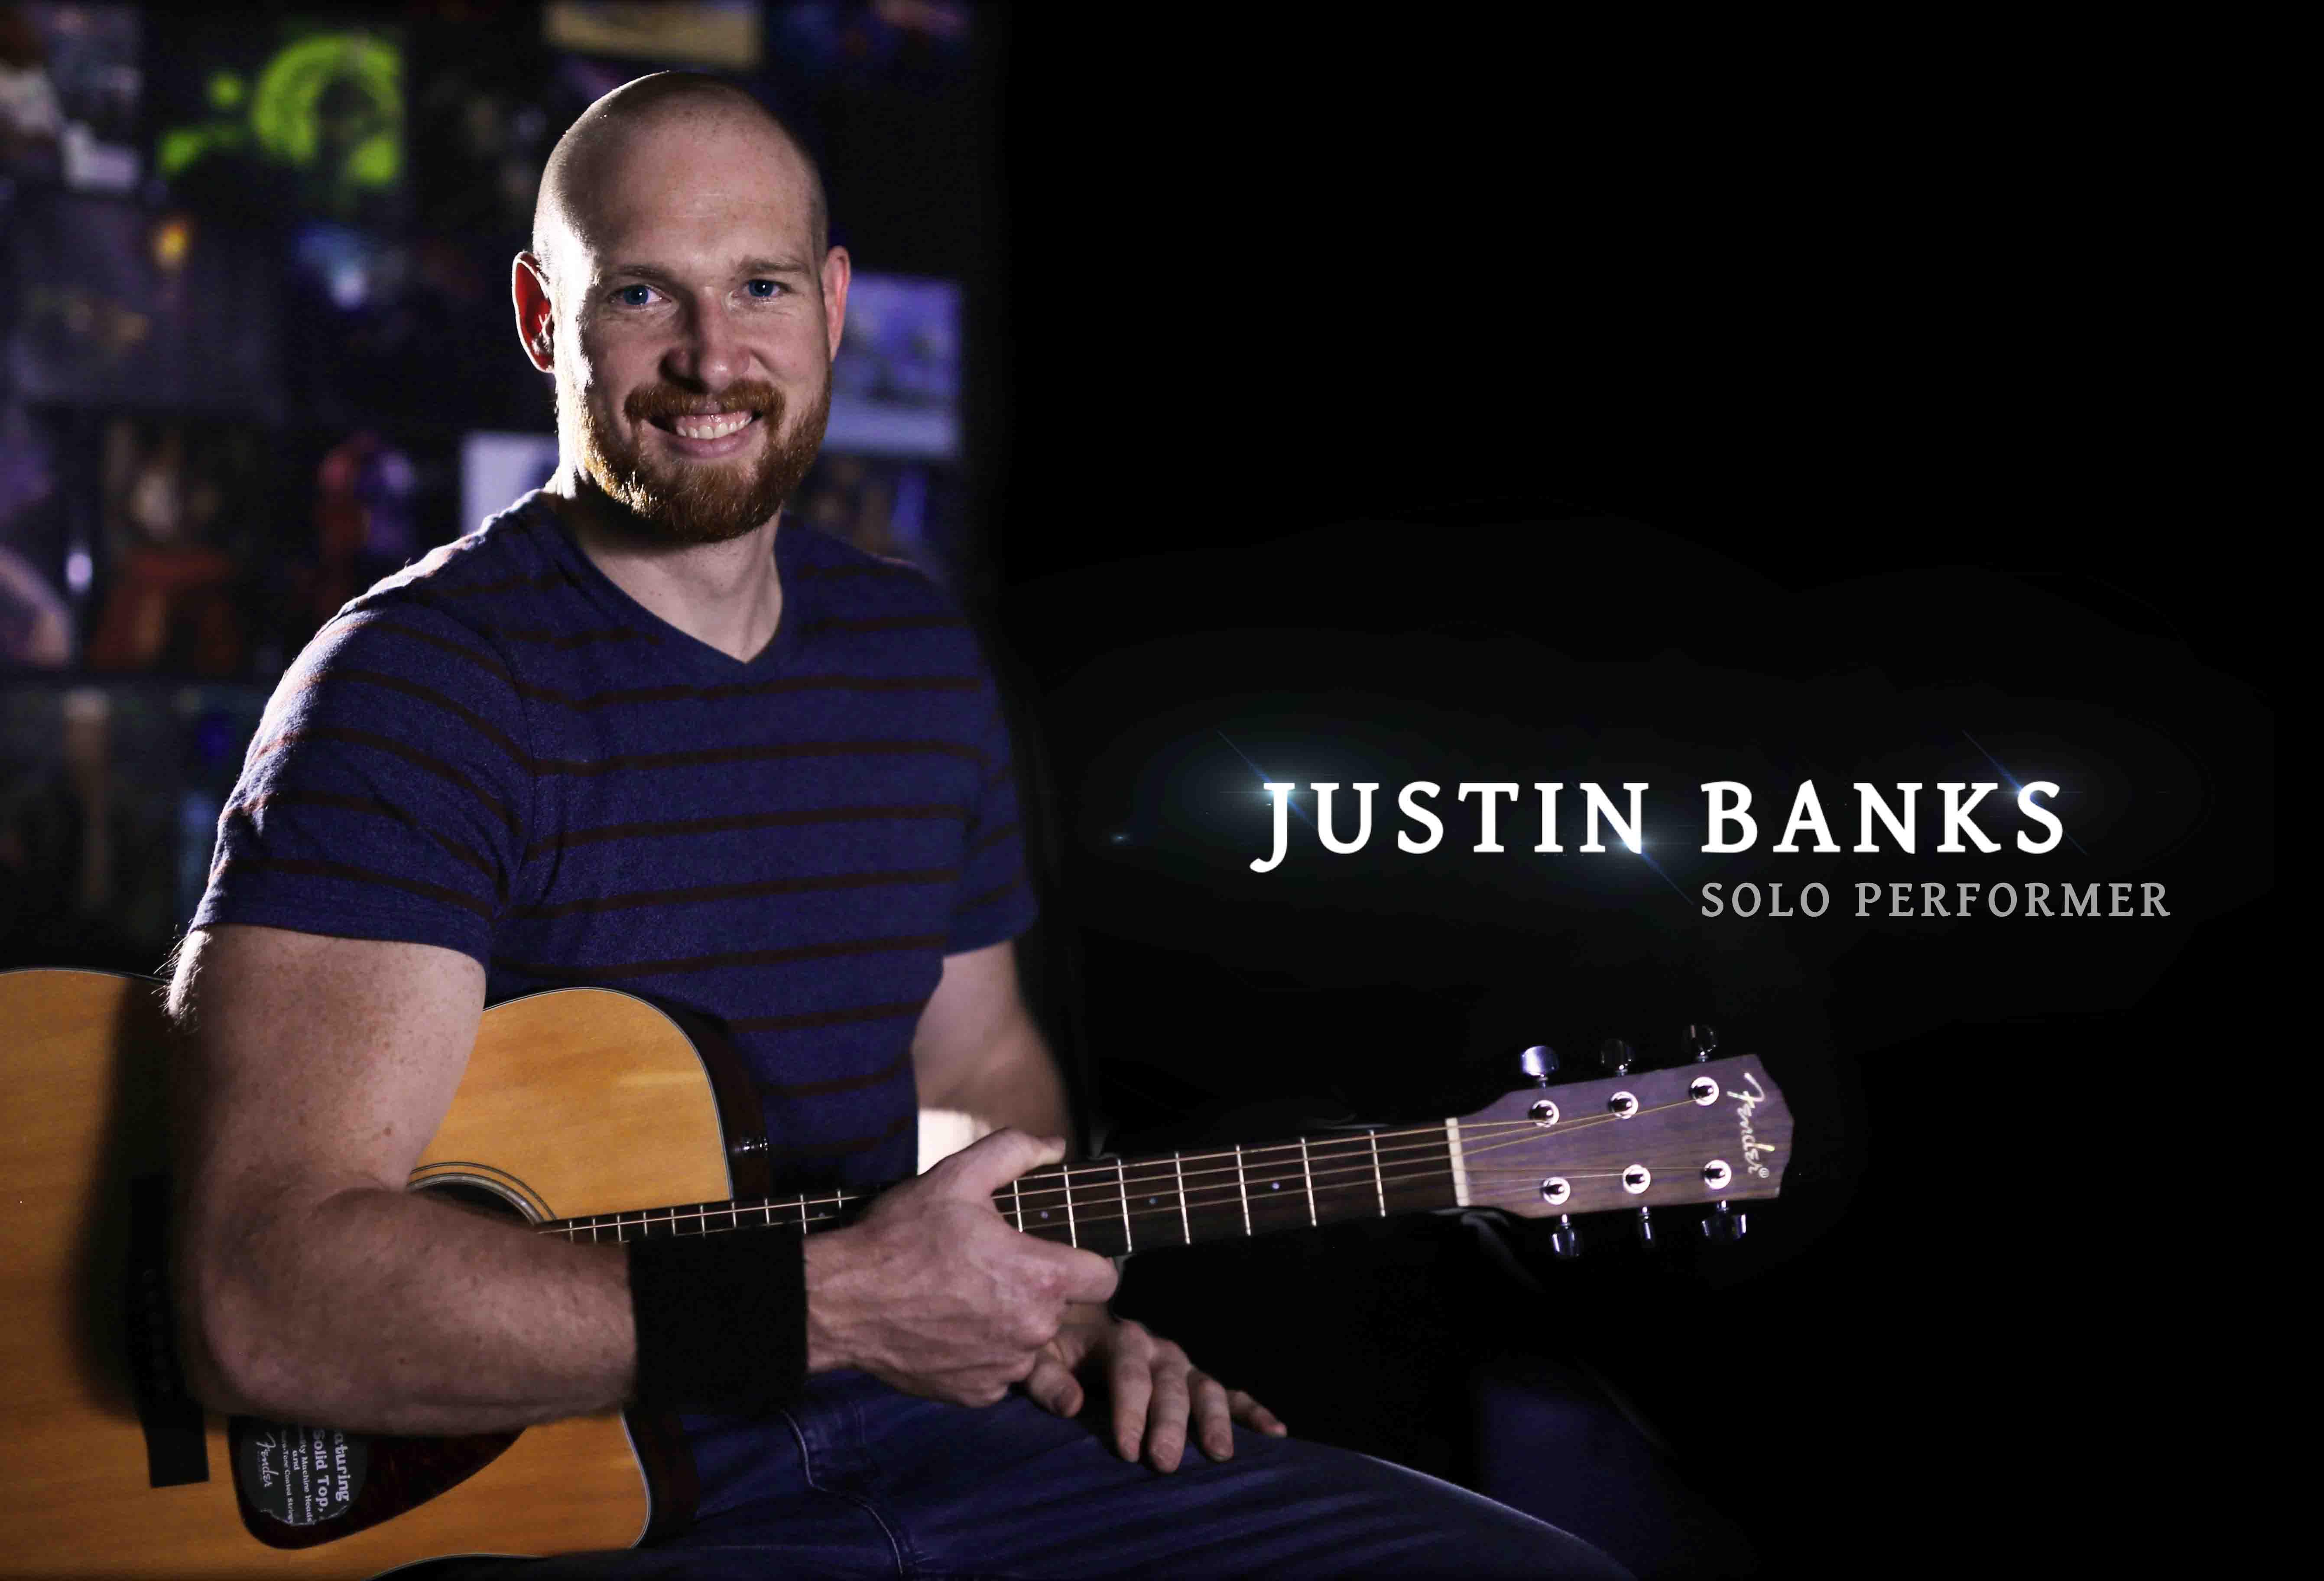 Justin Banks